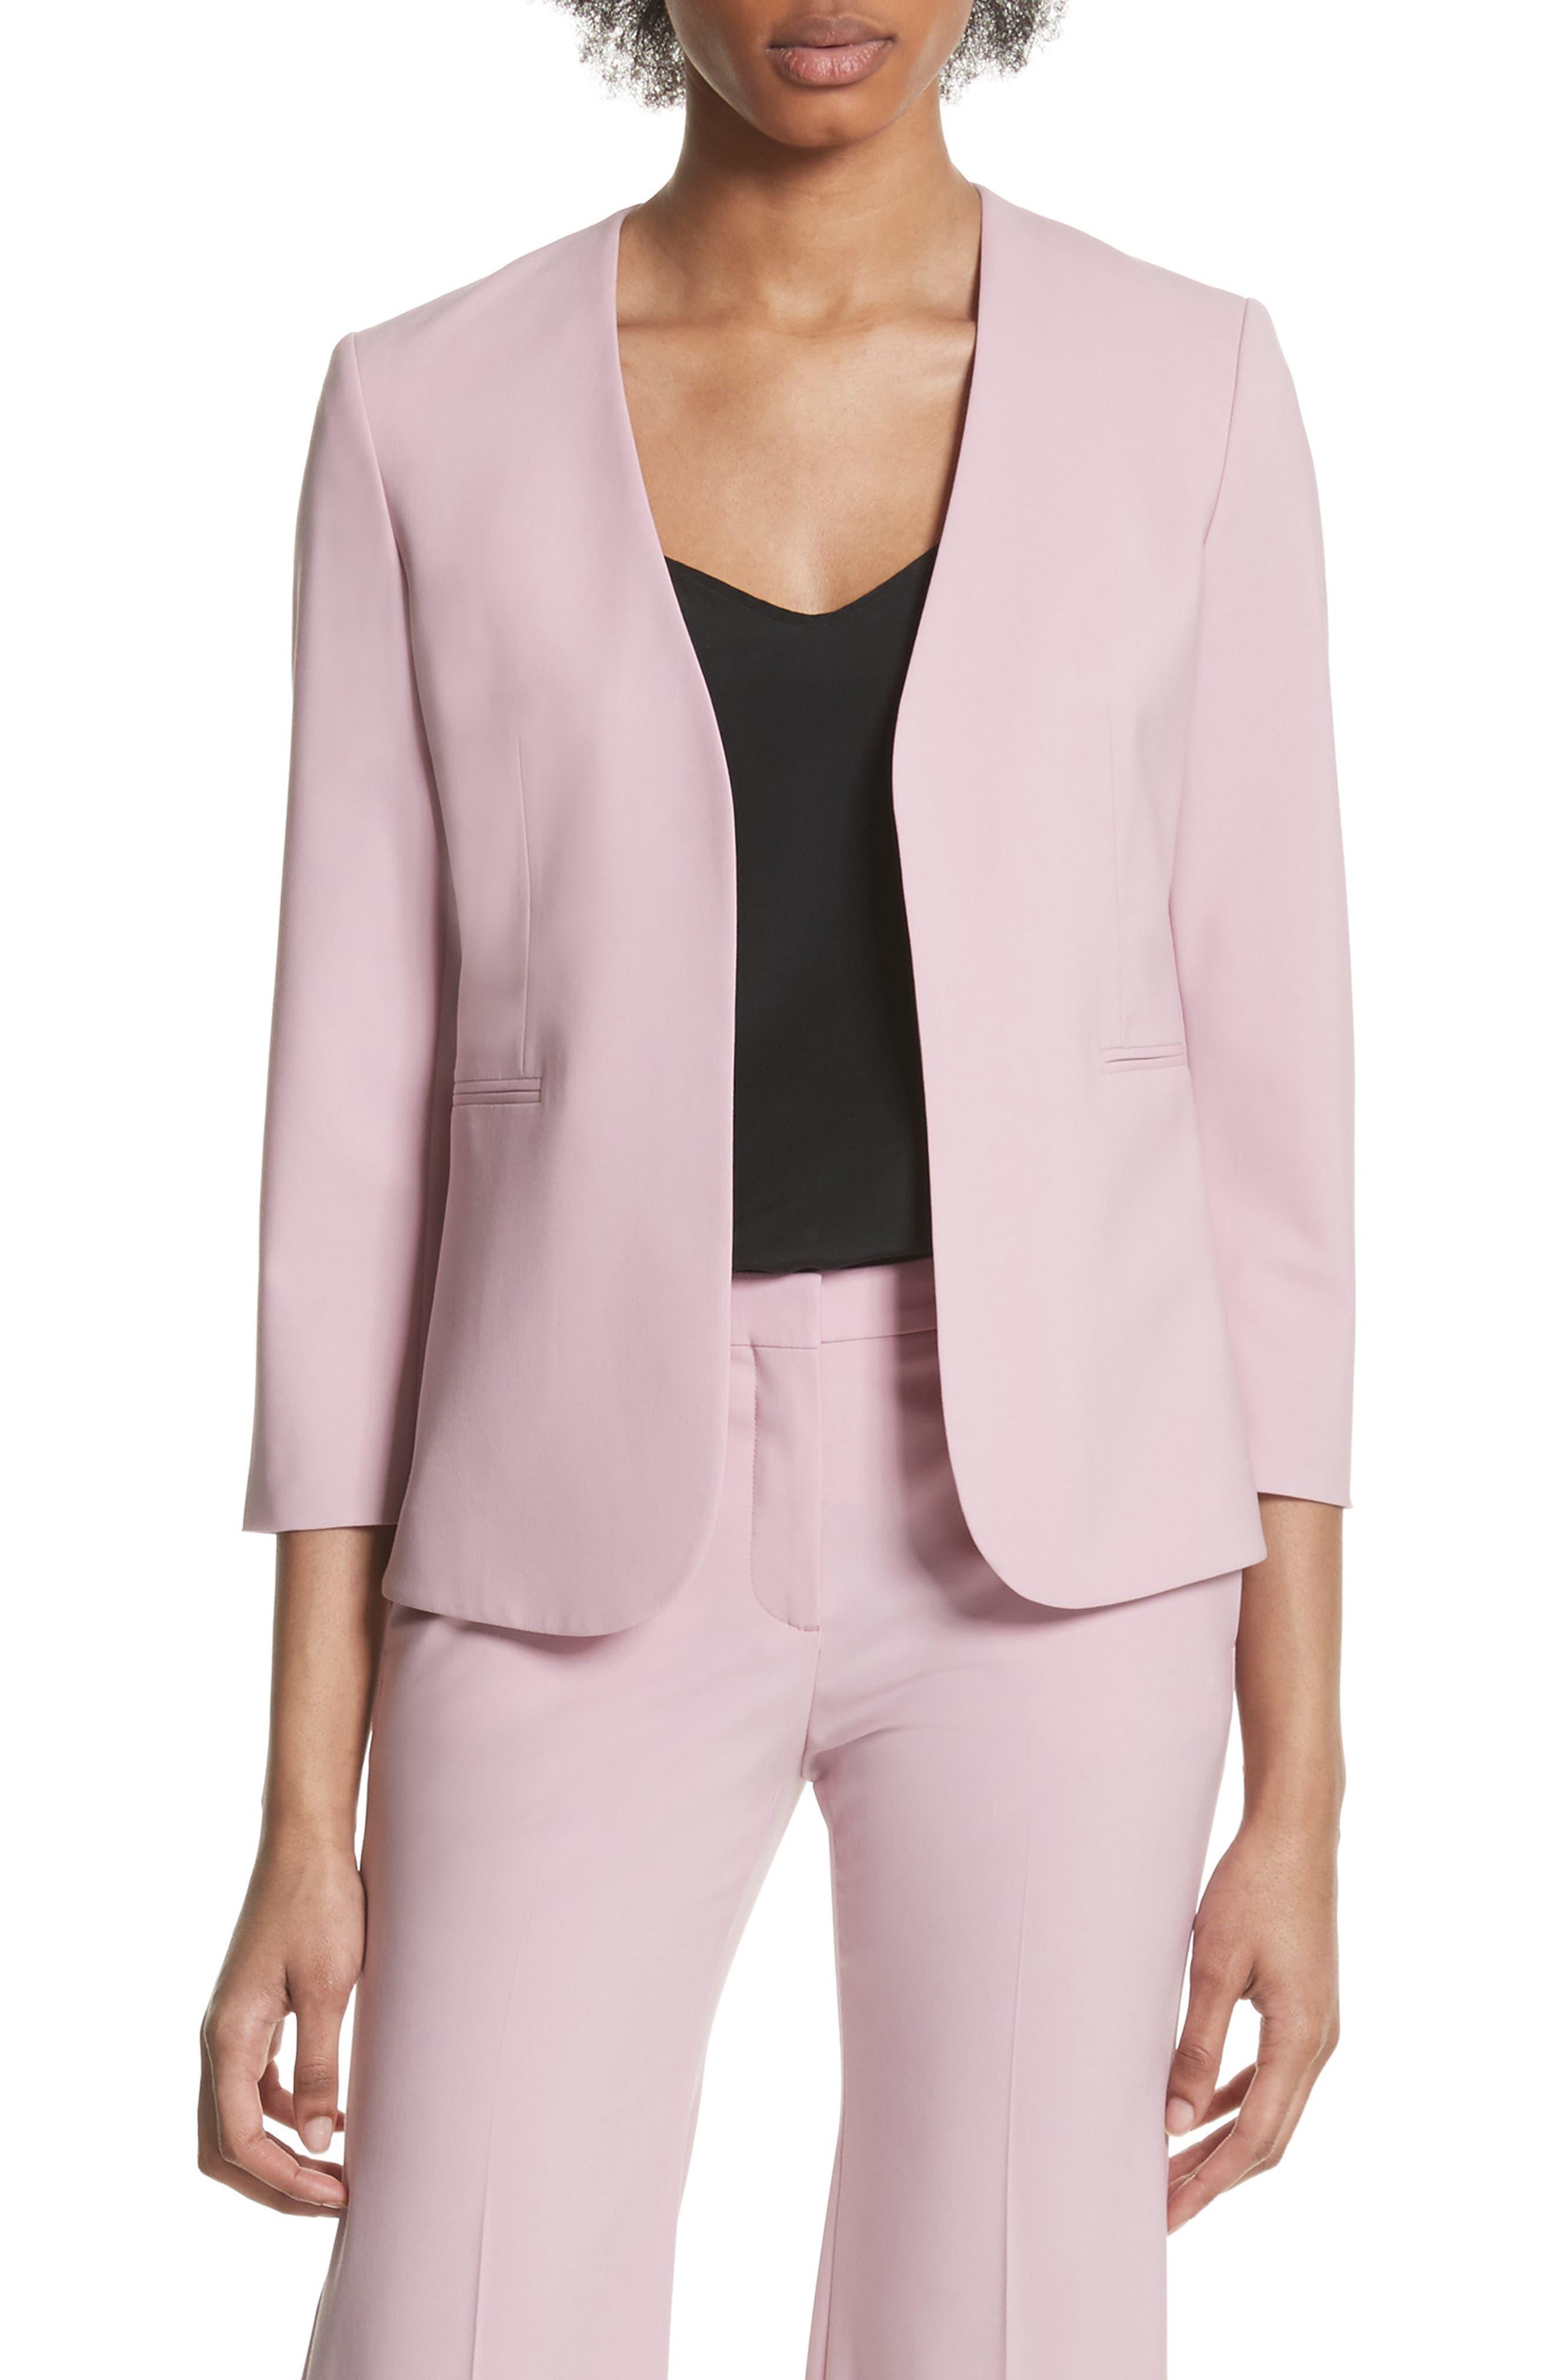 Lindrayia B Good Wool Suit Jacket,                         Main,                         color, 655